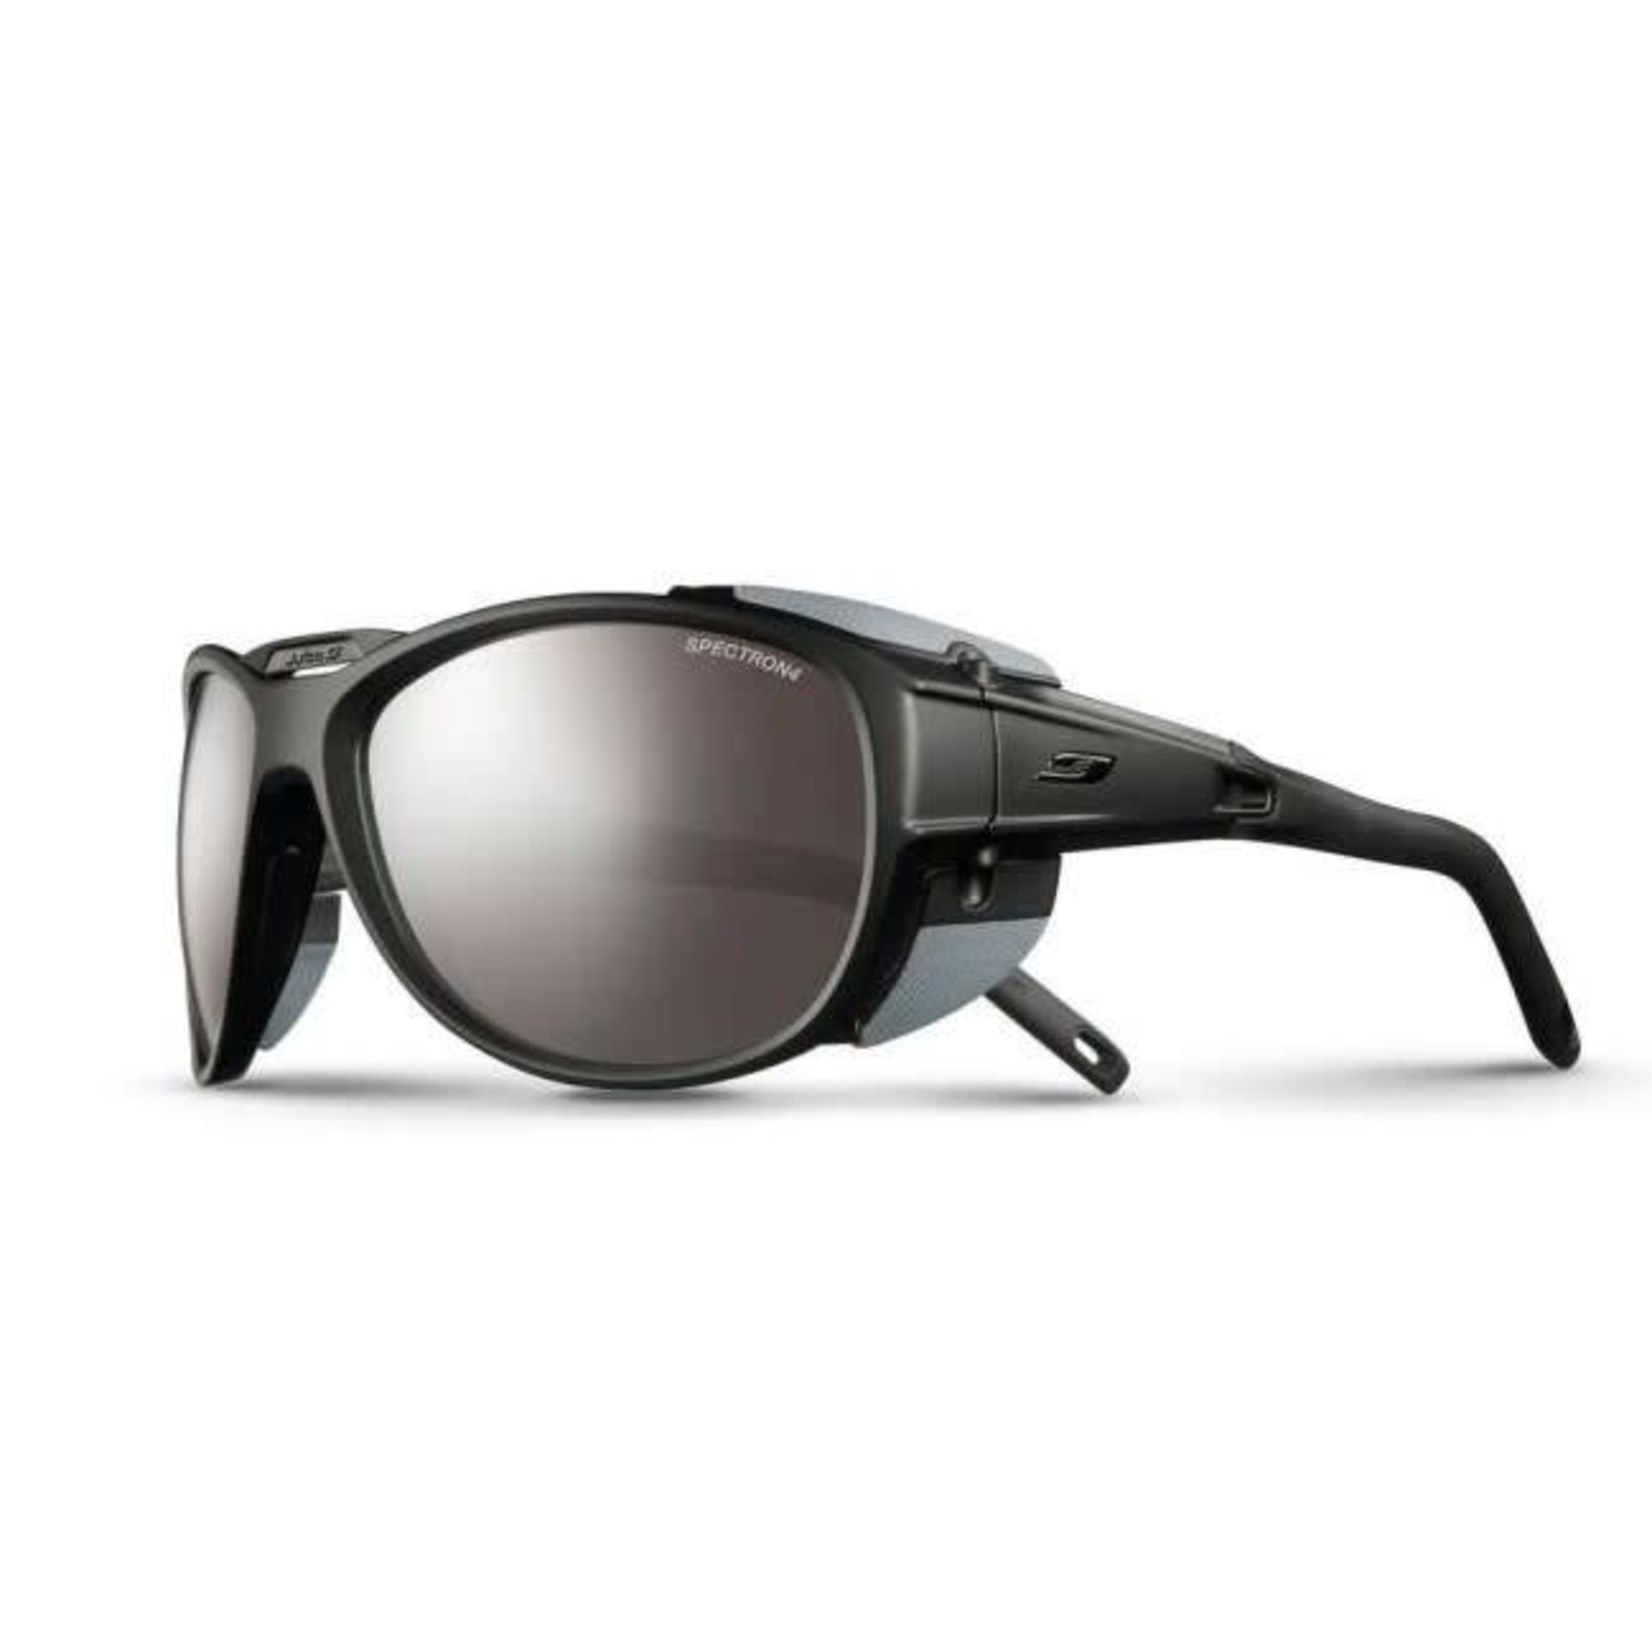 Julbo Julbo Explorer 2.0 Sunglasses - Men